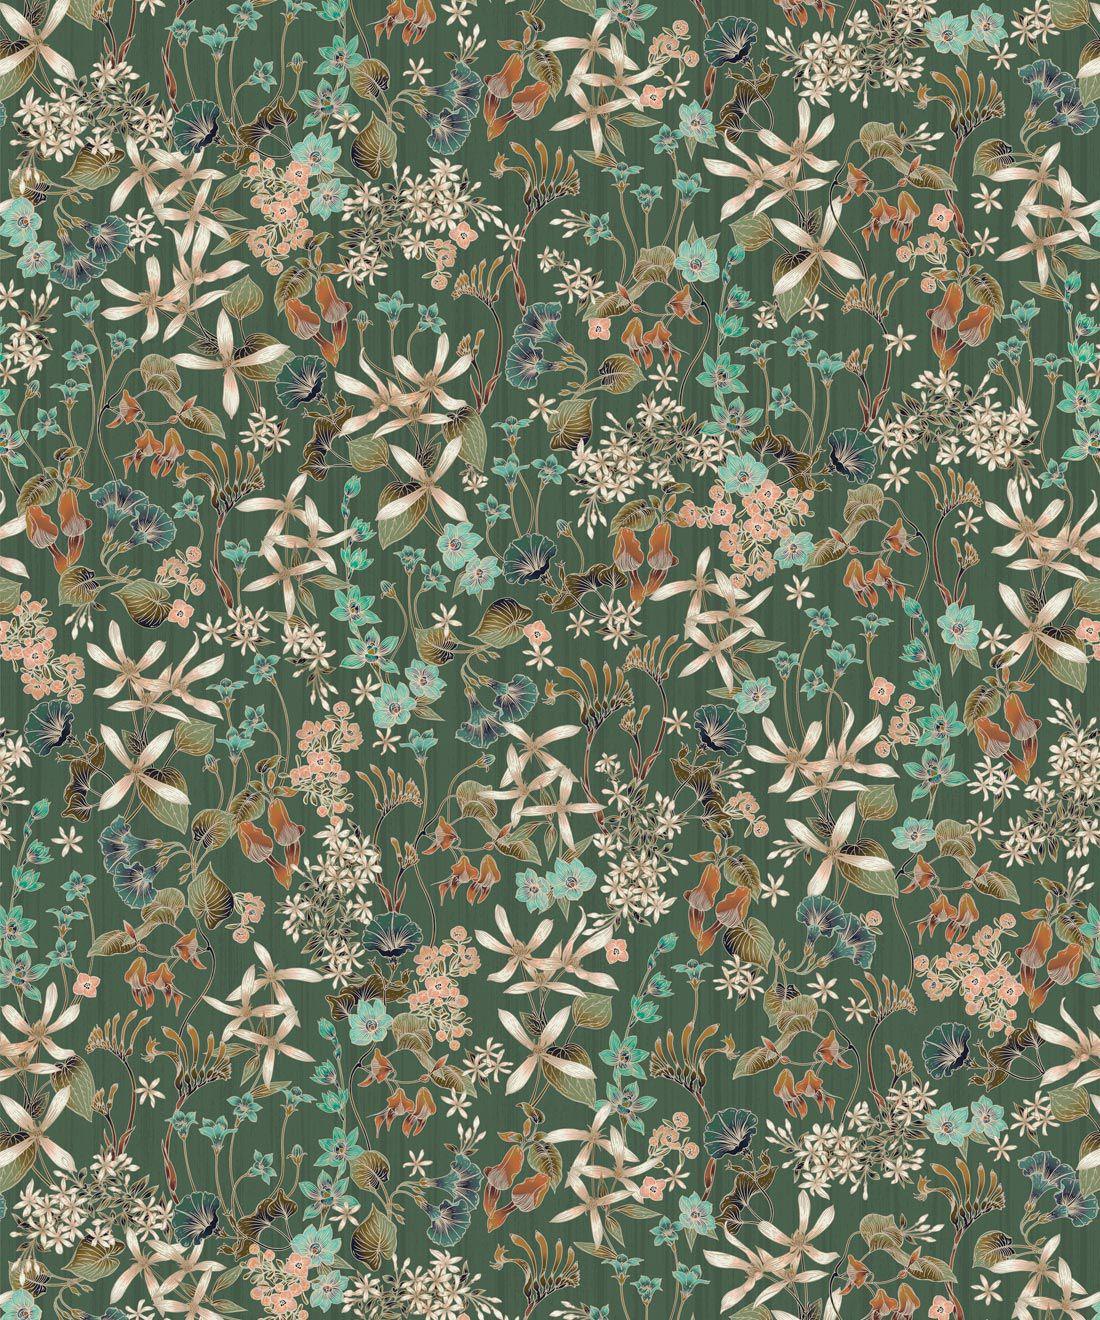 County Flowers Wallpaper • Eloise Short • Vintage Floral Wallpaper •Granny Chic Wallpaper • Grandmillennial Style Wallpaper •Avocado •Swatch